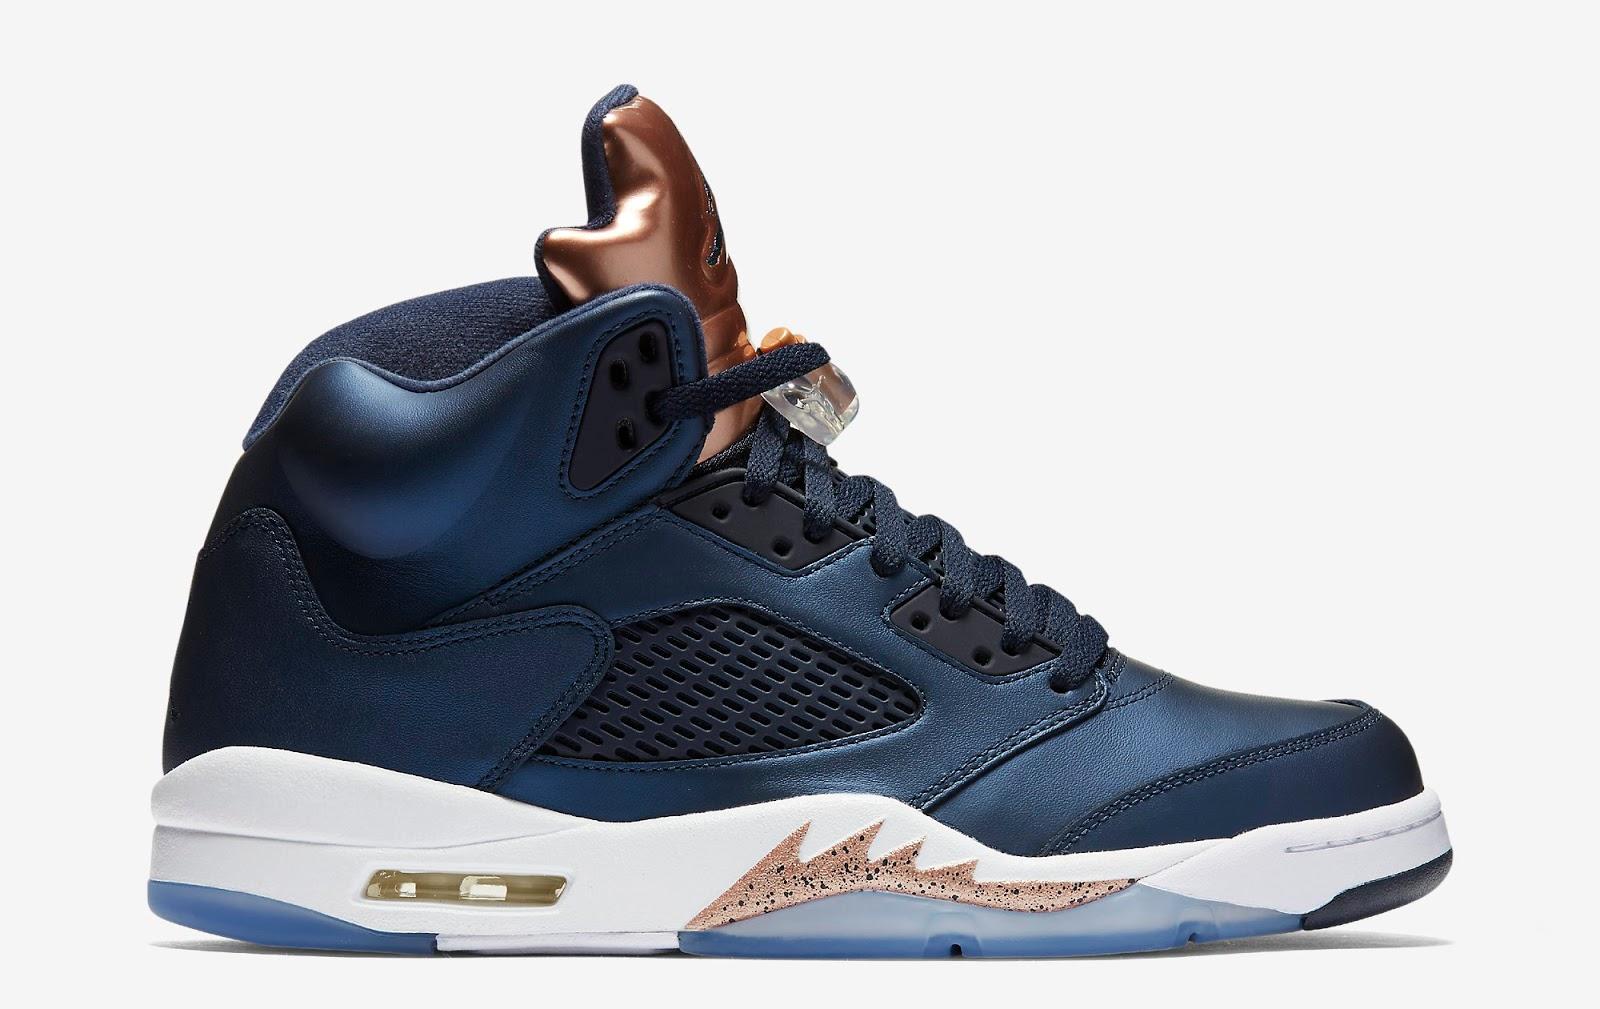 bb2a800bcd49b3 ajordanxi Your  1 Source For Sneaker Release Dates  Air Jordan 5 ...